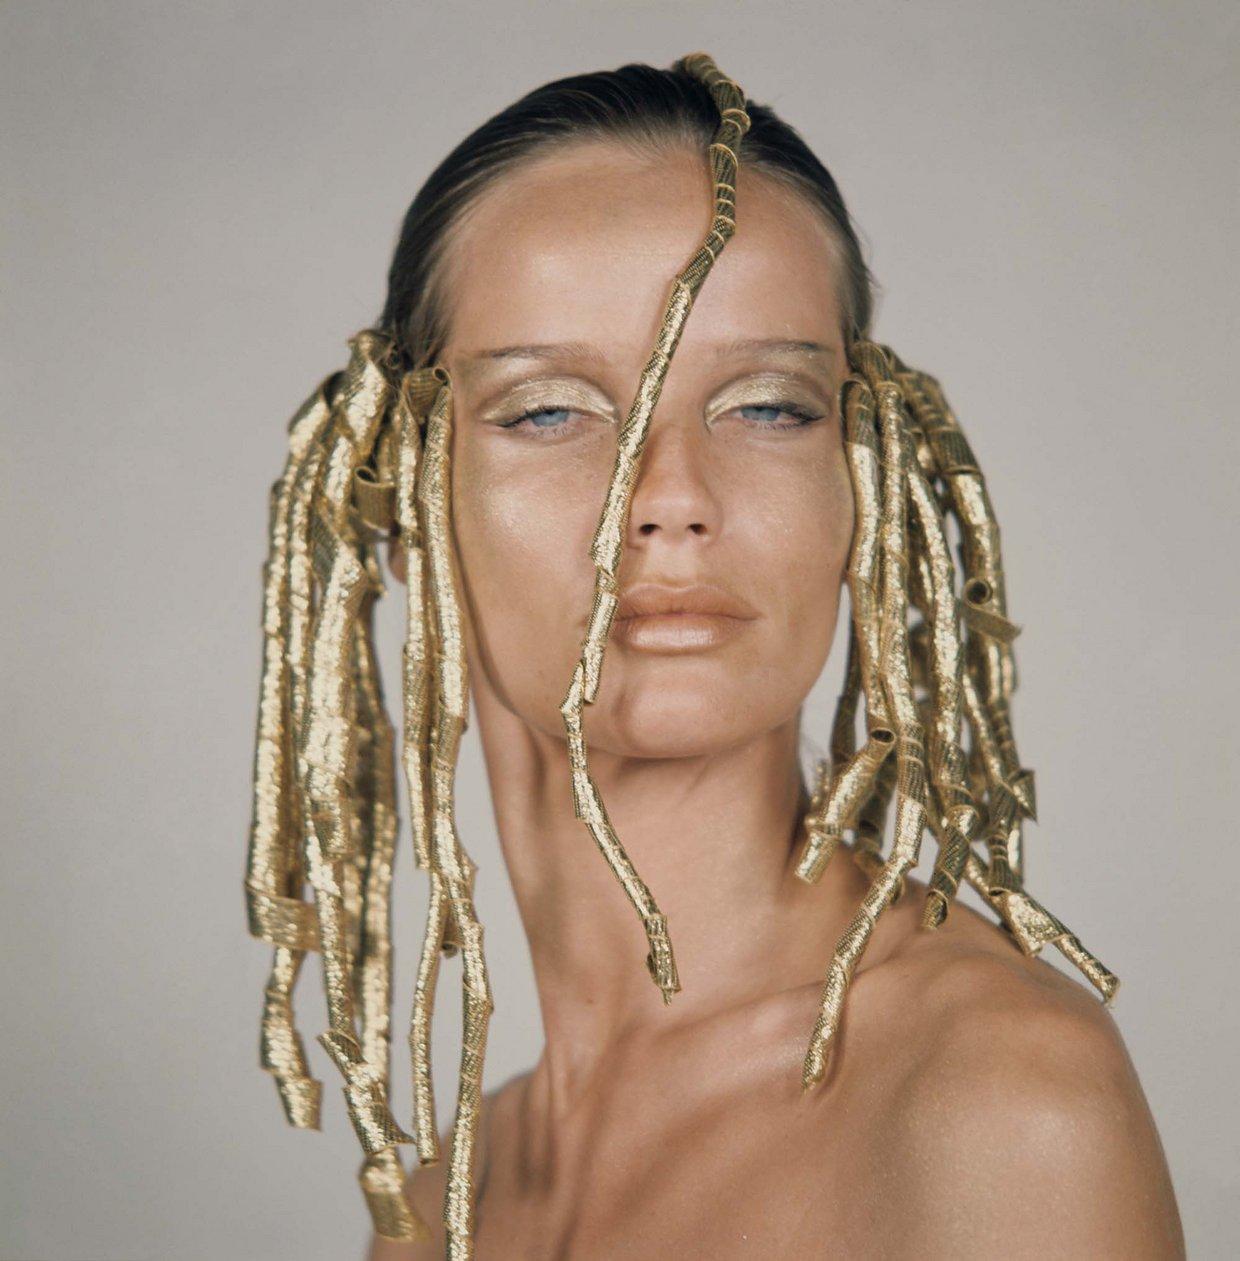 08-beauty-futurism-vogue